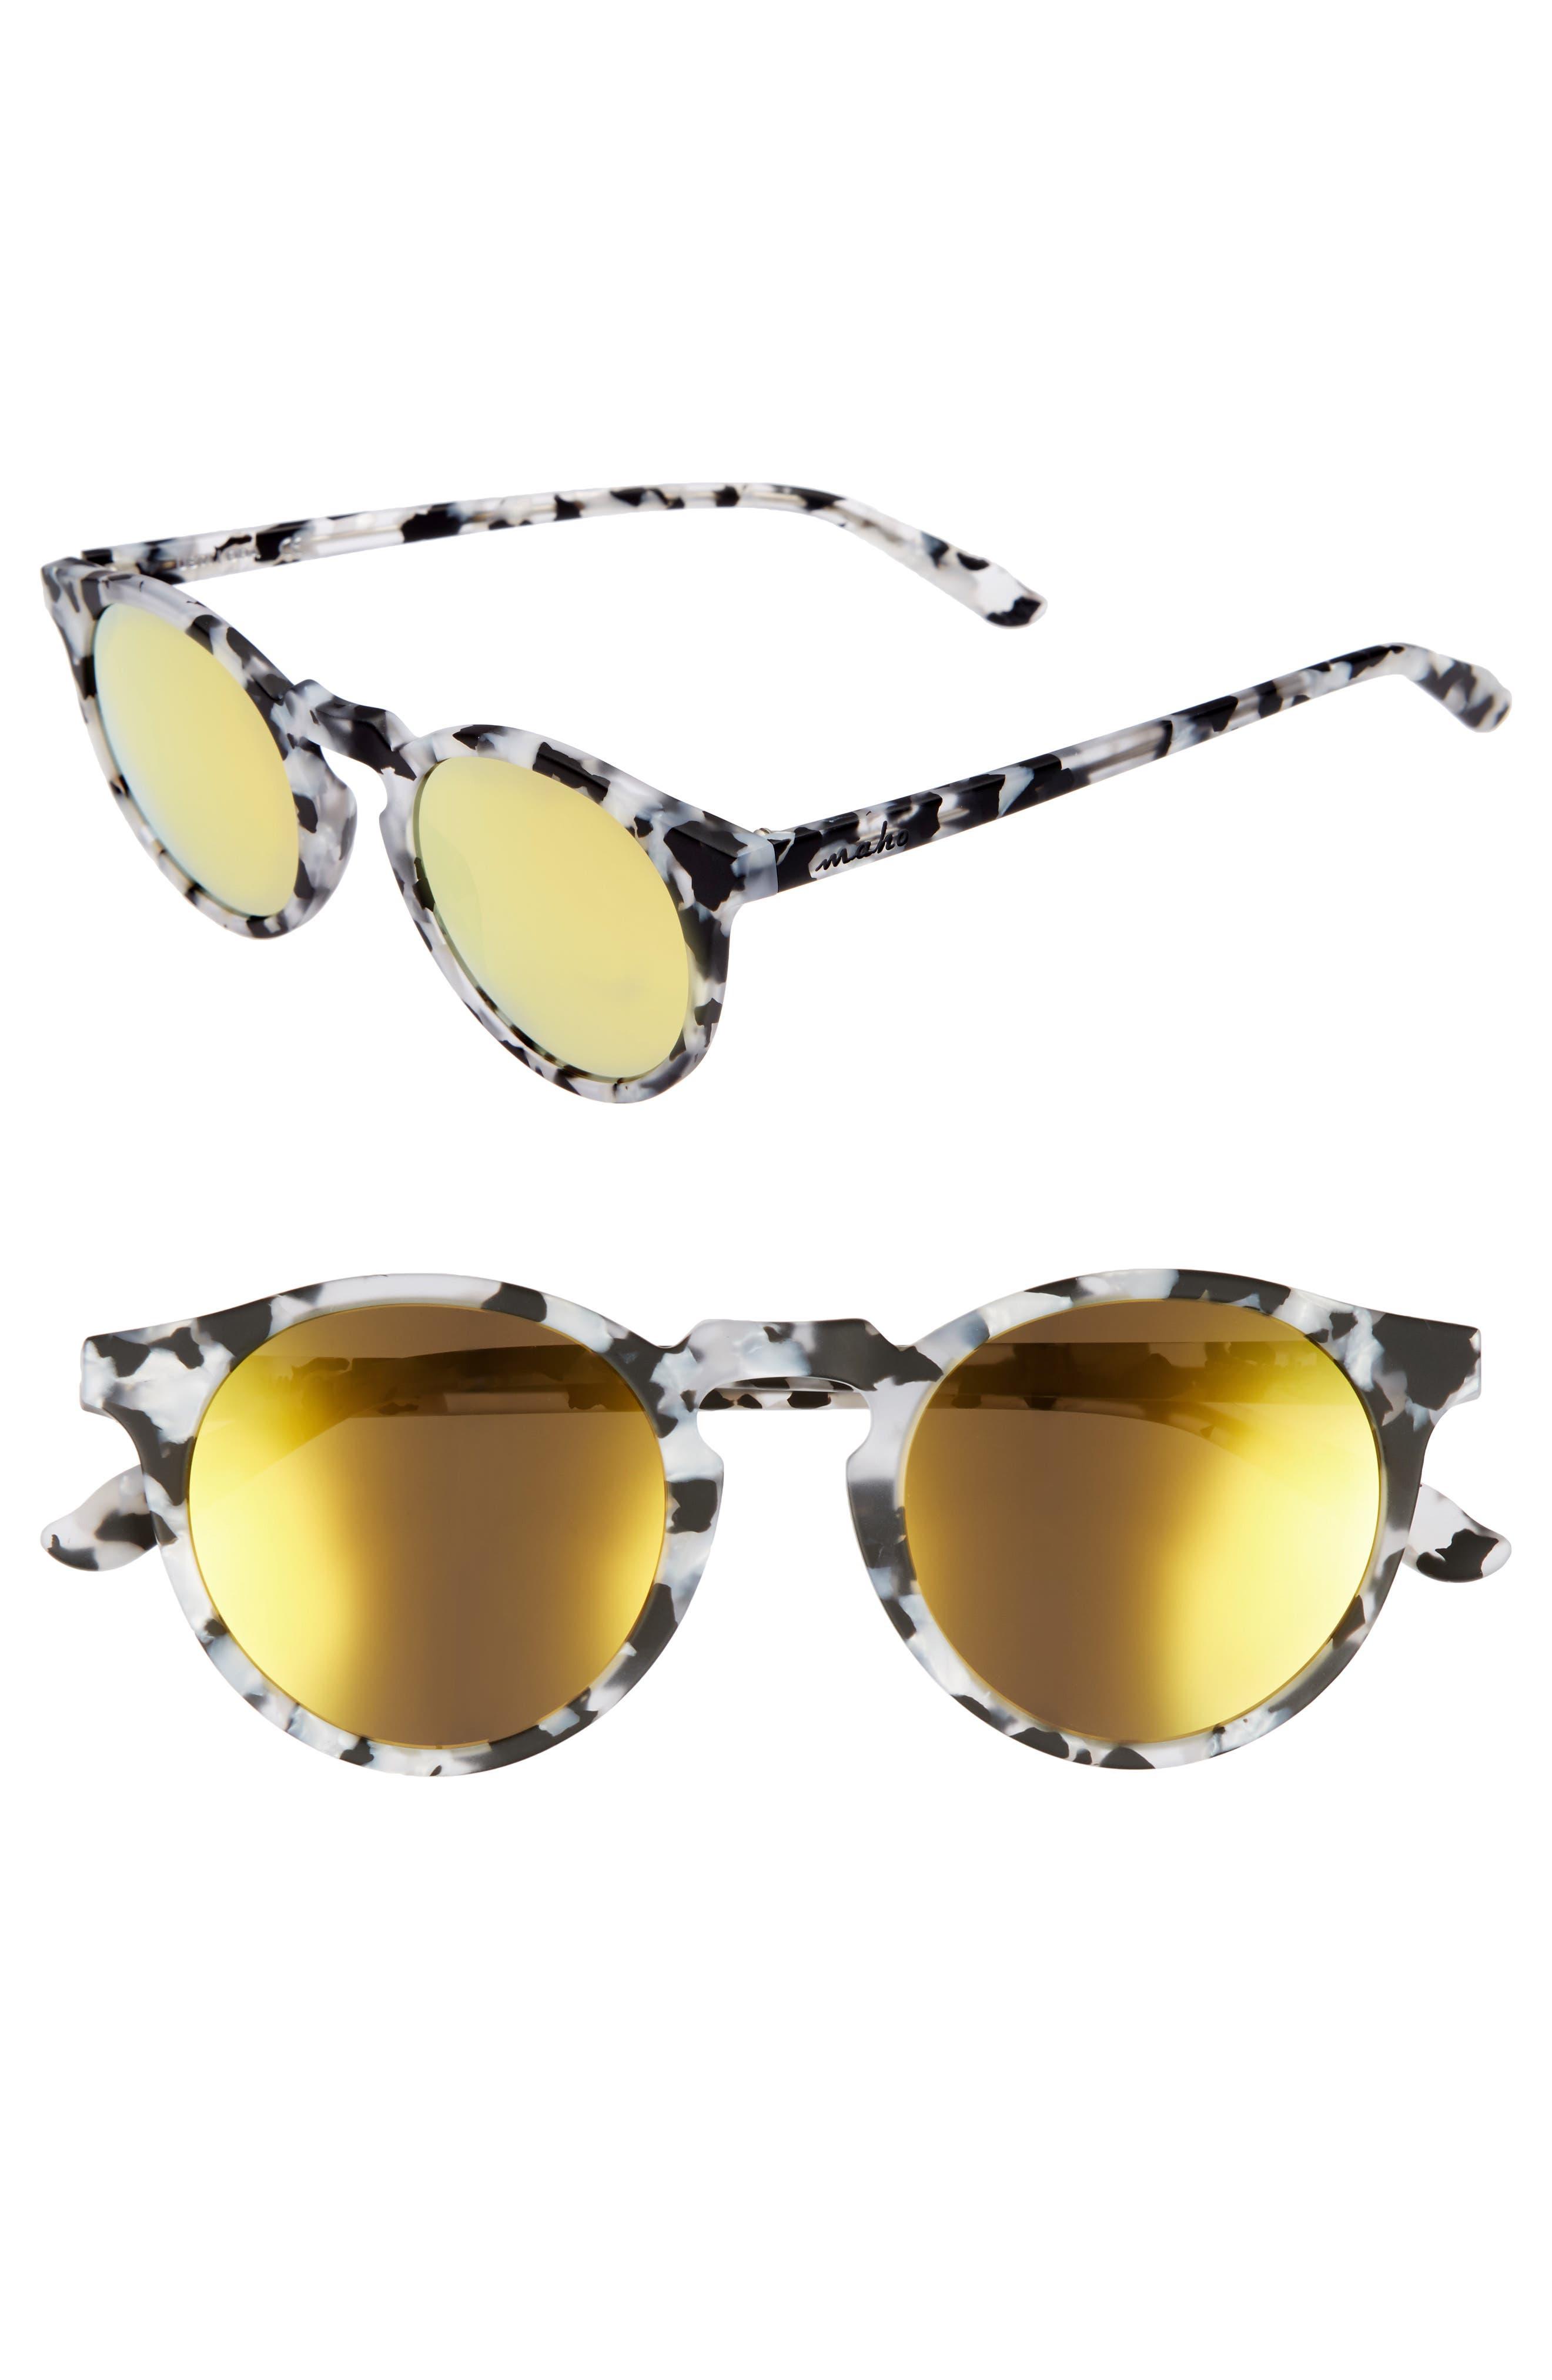 Stockholm 48mm Polarized Round Sunglasses,                             Main thumbnail 1, color,                             001